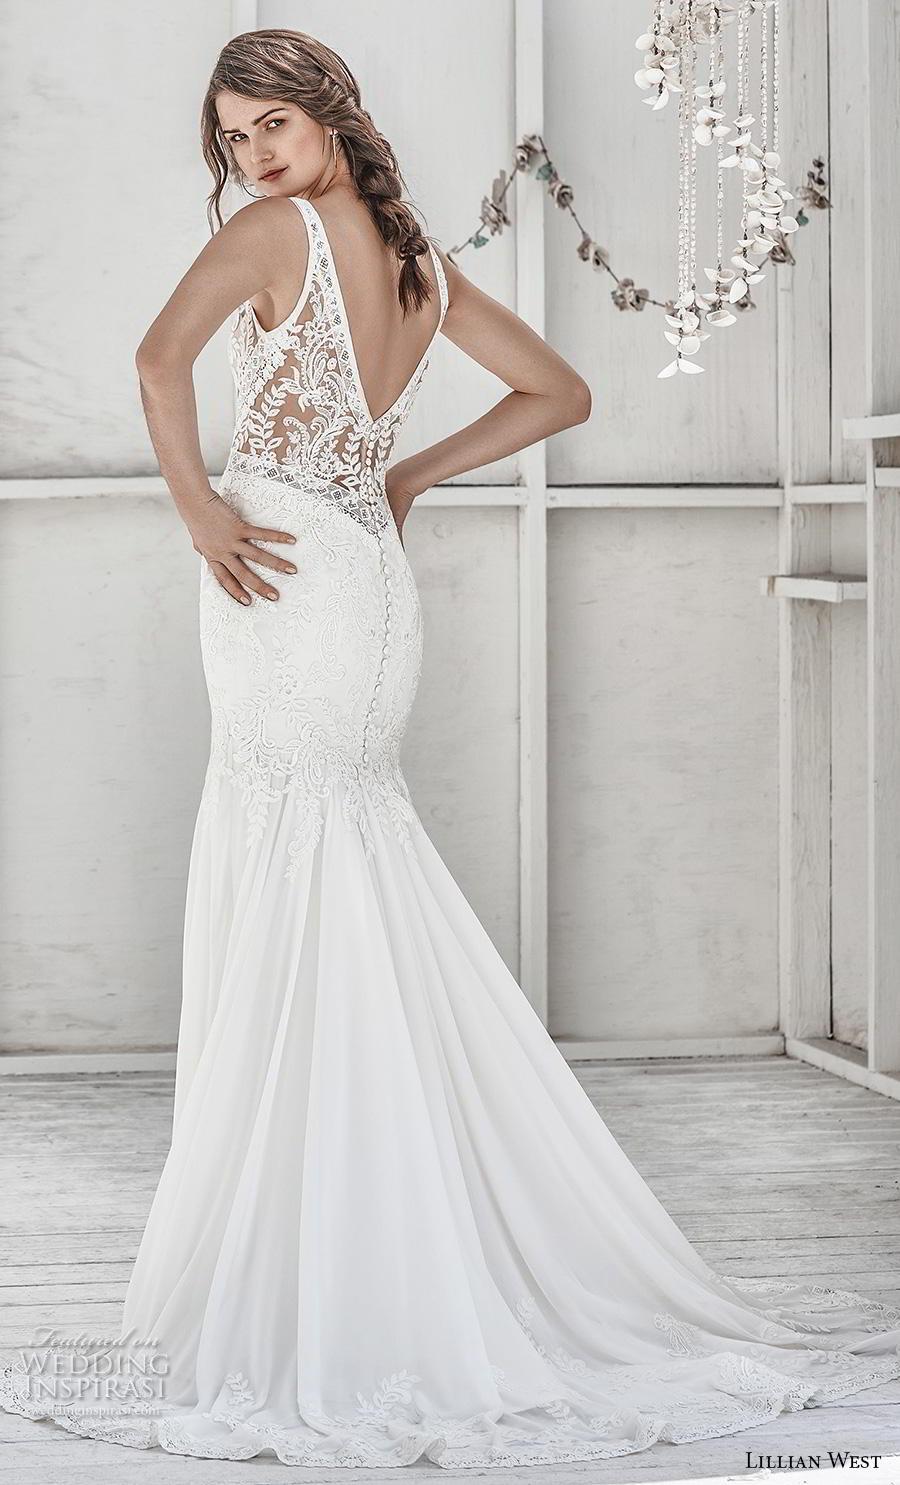 lillian west spring 2019 bridal sleeveless with strap v neck heavily embellished bodice elegant trumpet wedding dress backless v back medium train (3) bv